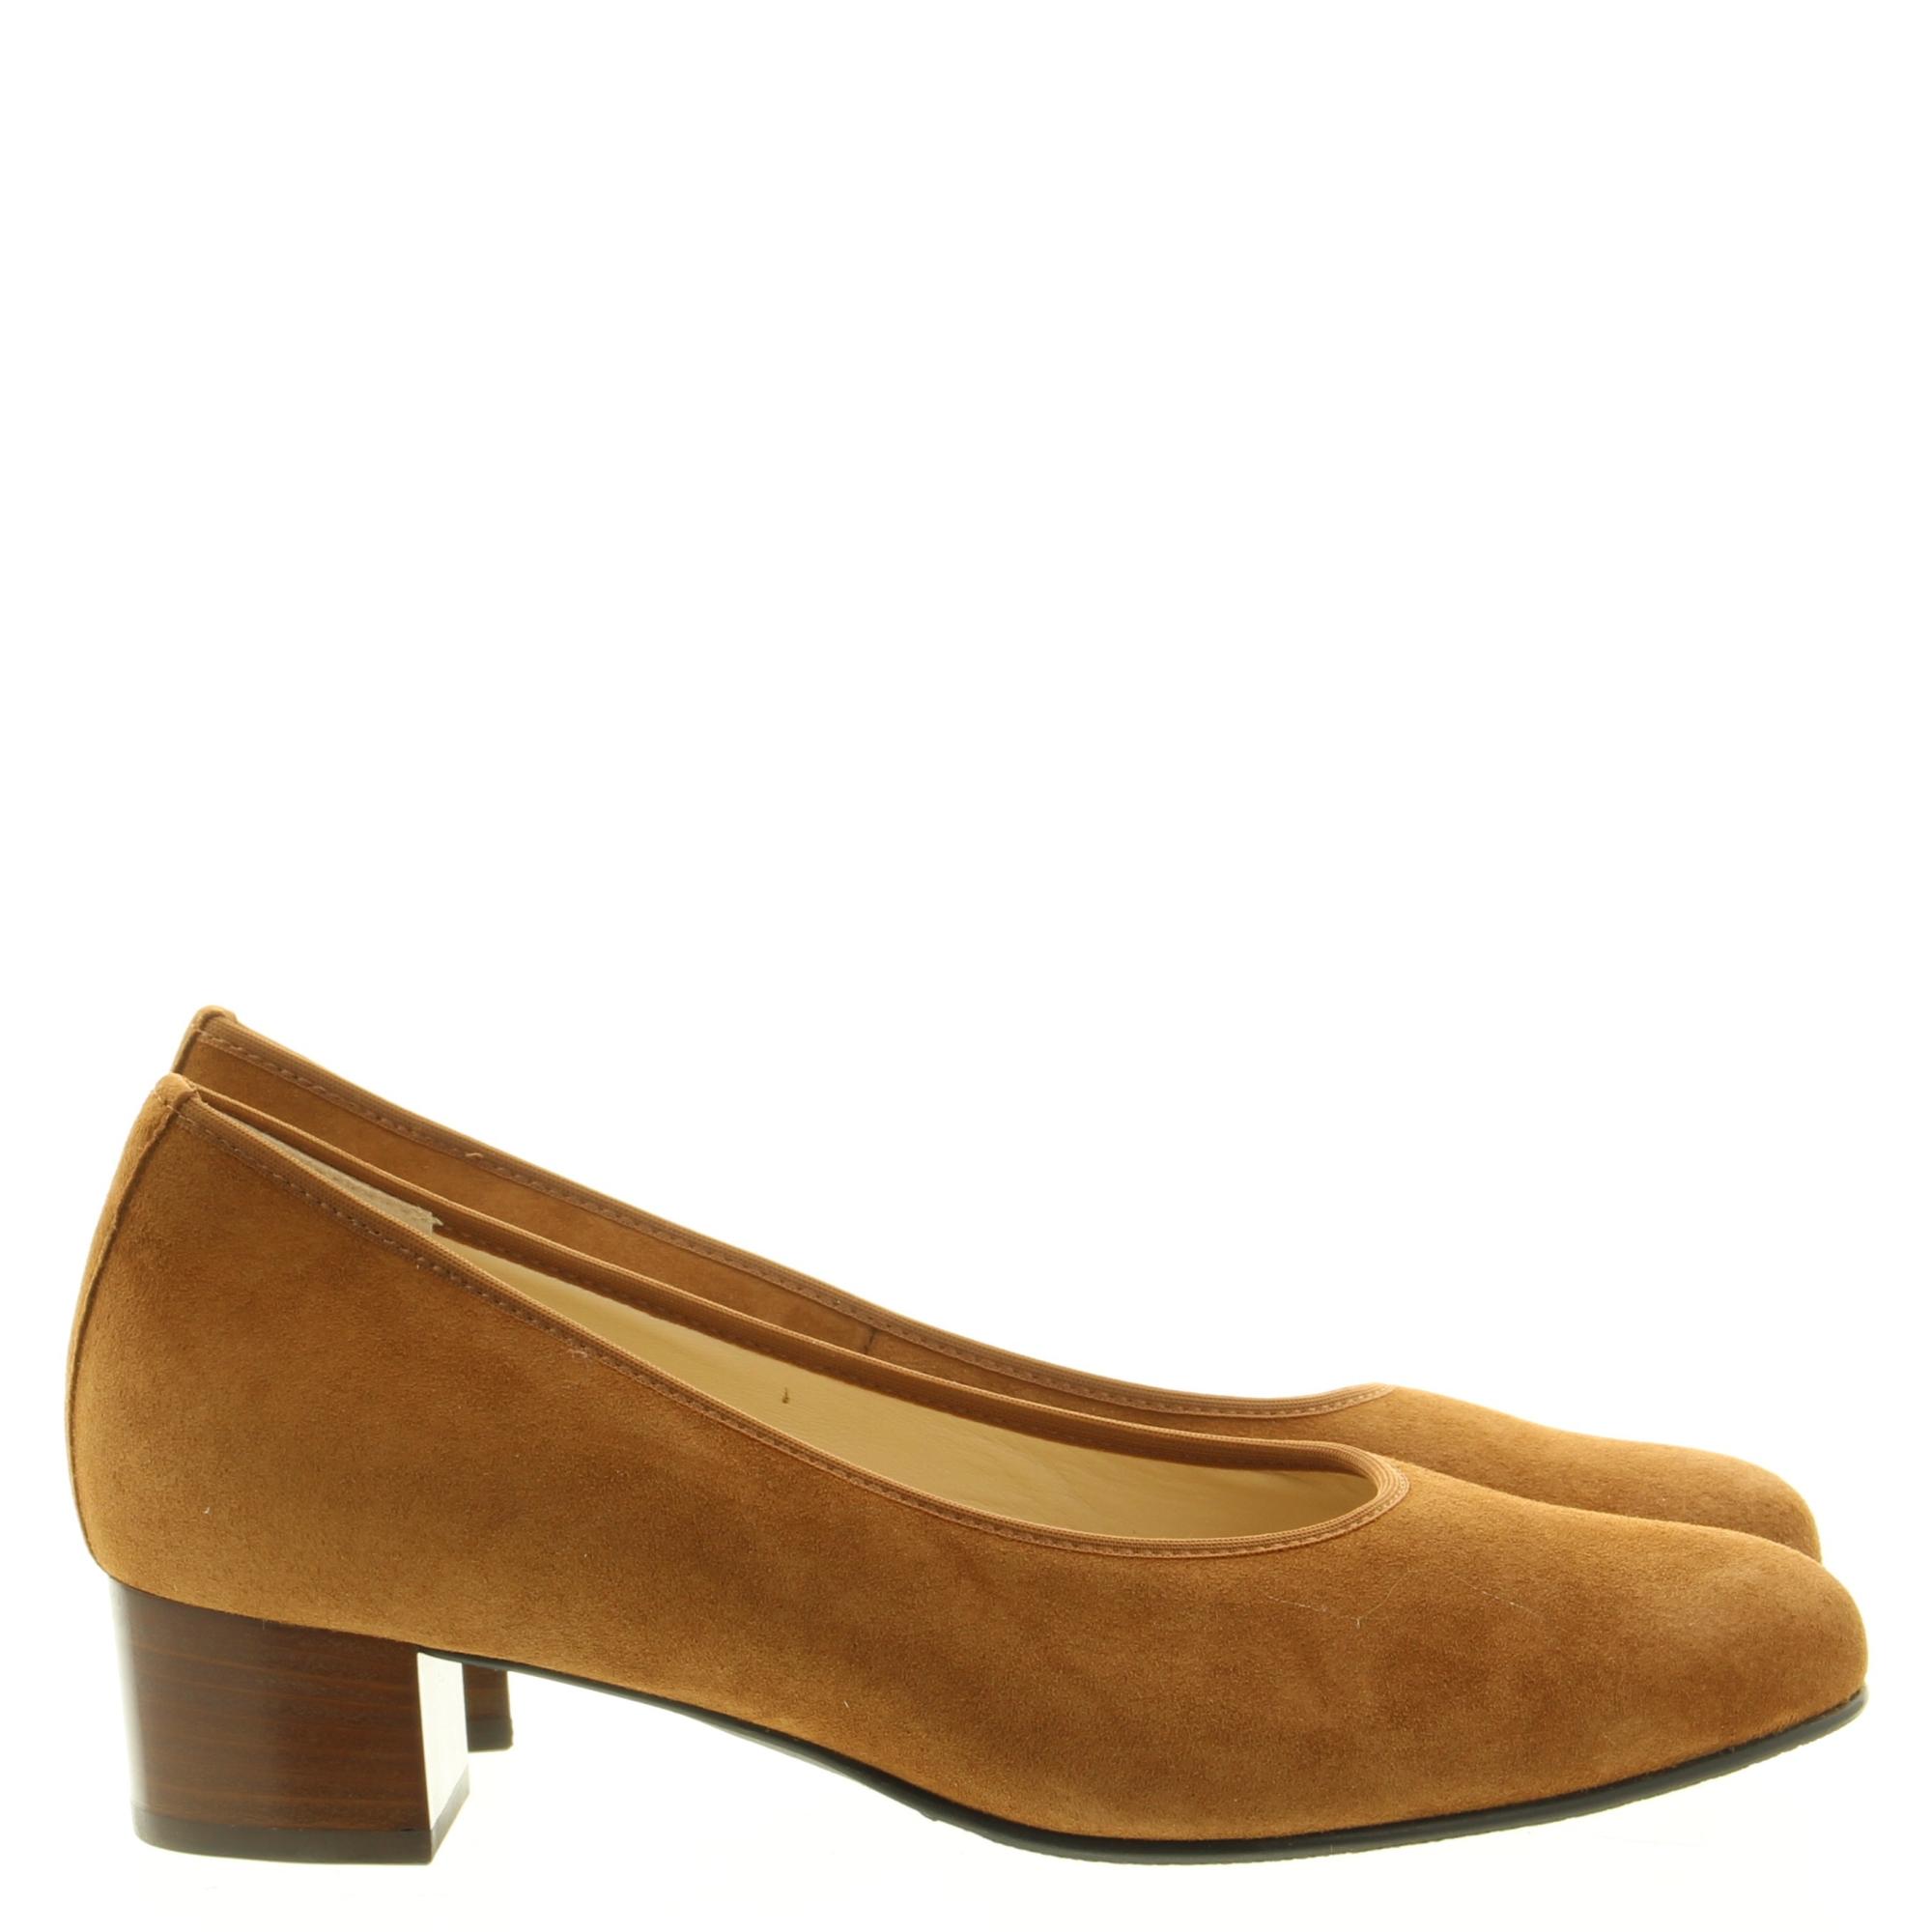 Hassia Shoes 303002 Siena 2500 Nougat